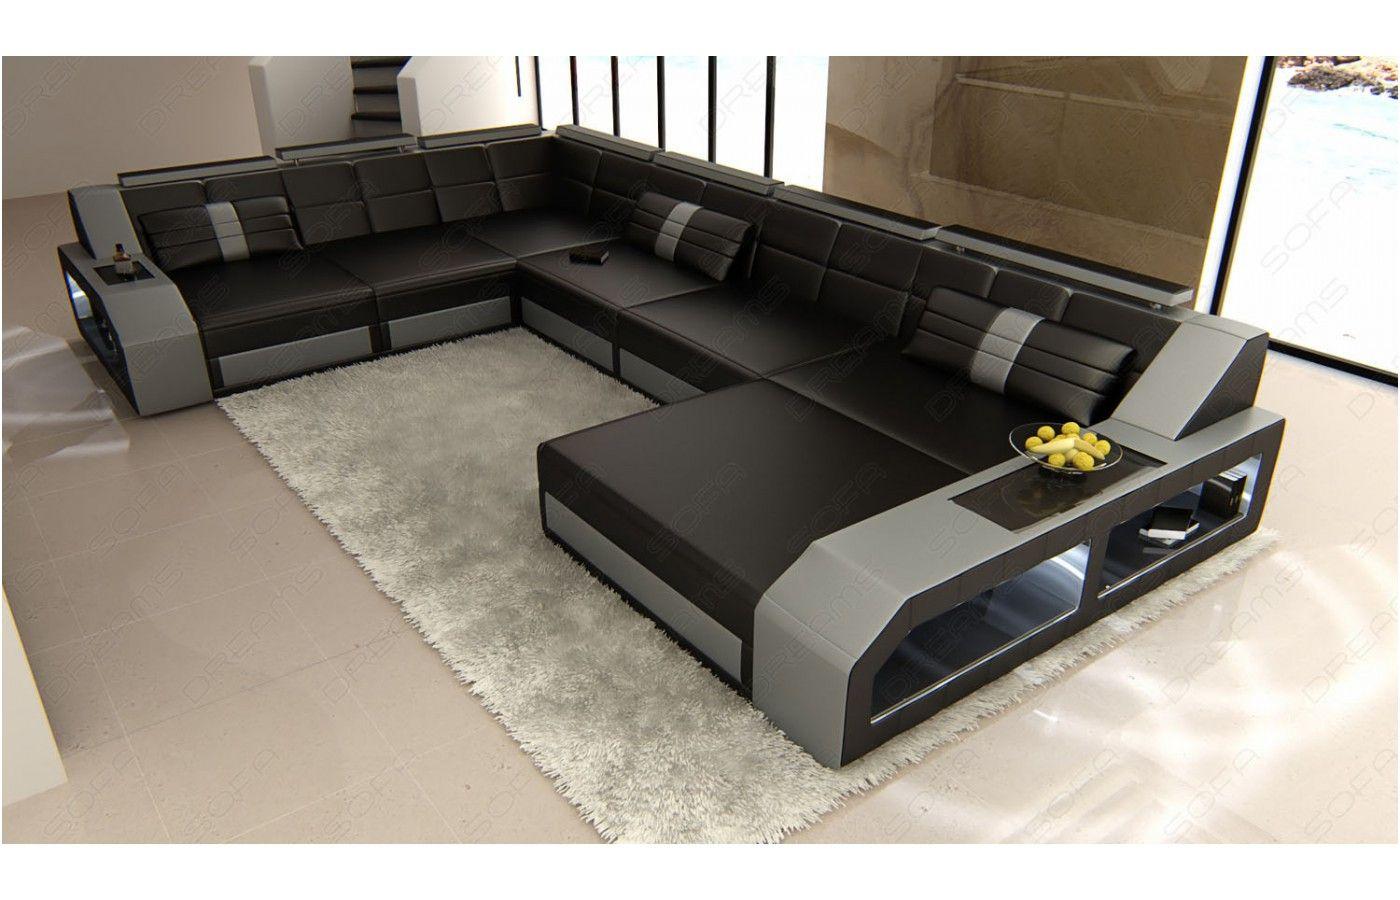 Majestatisch Sofa L Form Mit Schlaffunktion Modern Sofa Sectional Luxury Sofa Grey Sectional Sofa